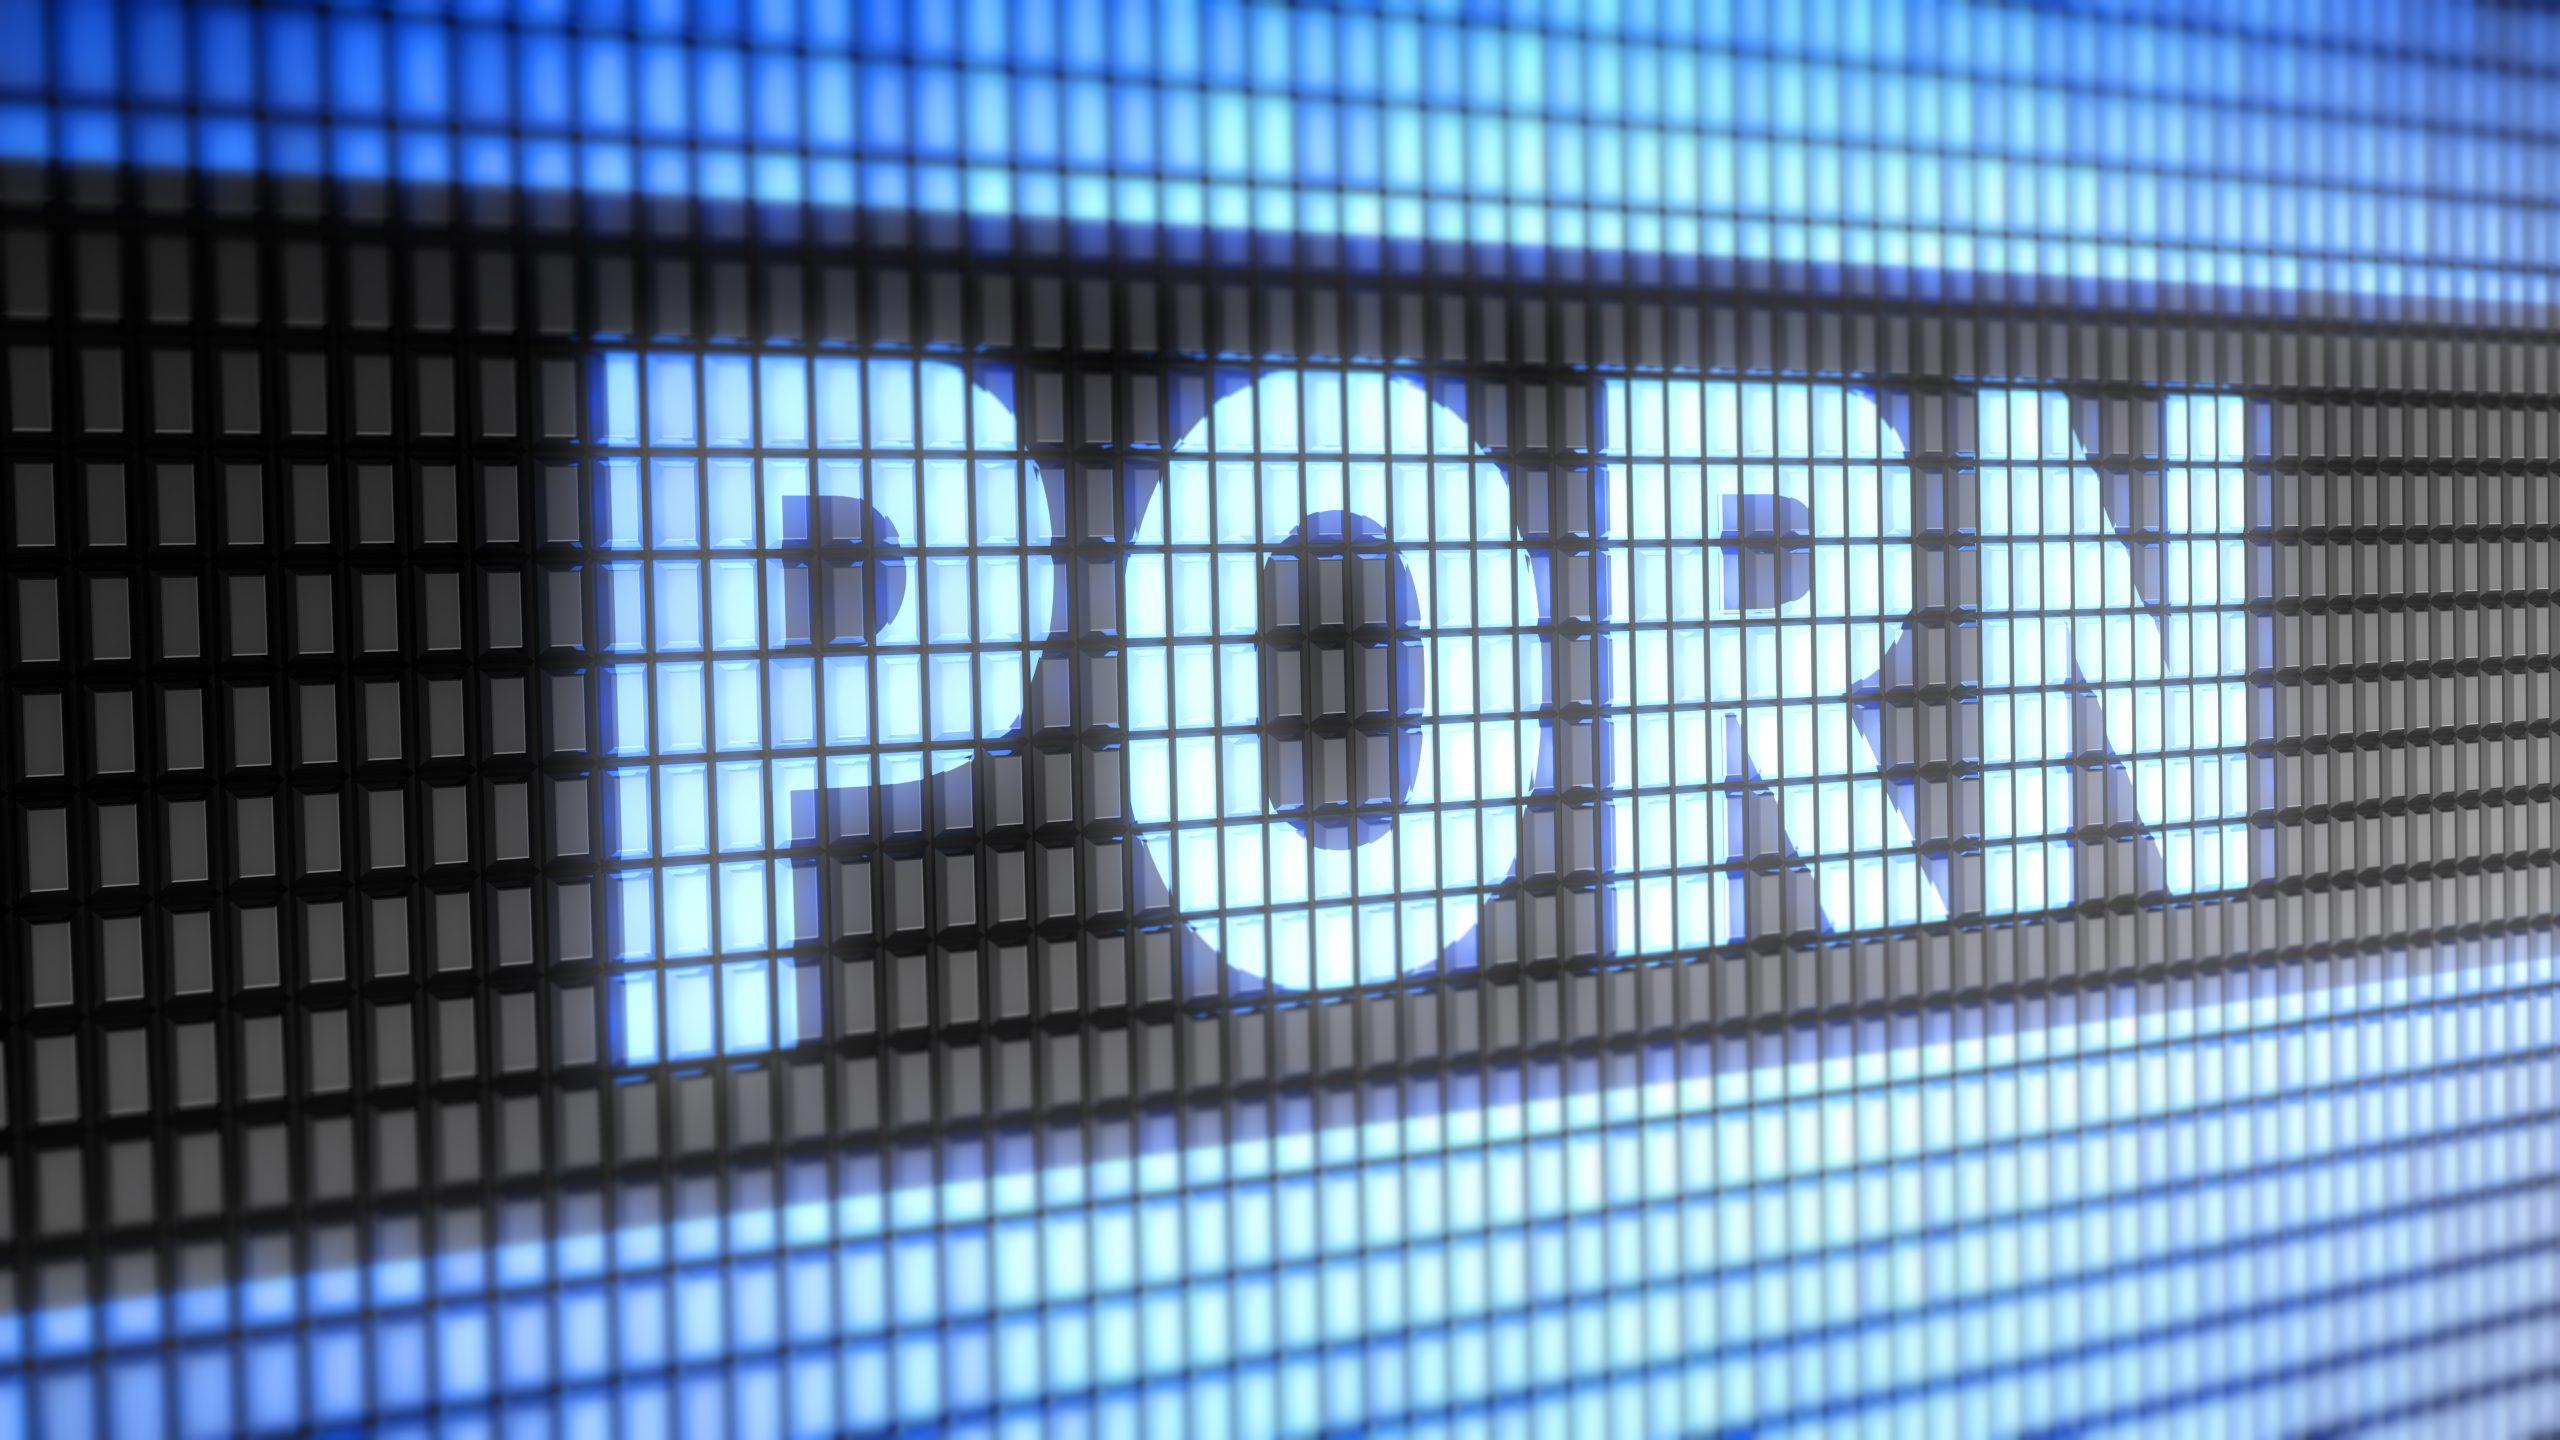 ISP Investigate Alleged Porn Filmed At Jacksonville School